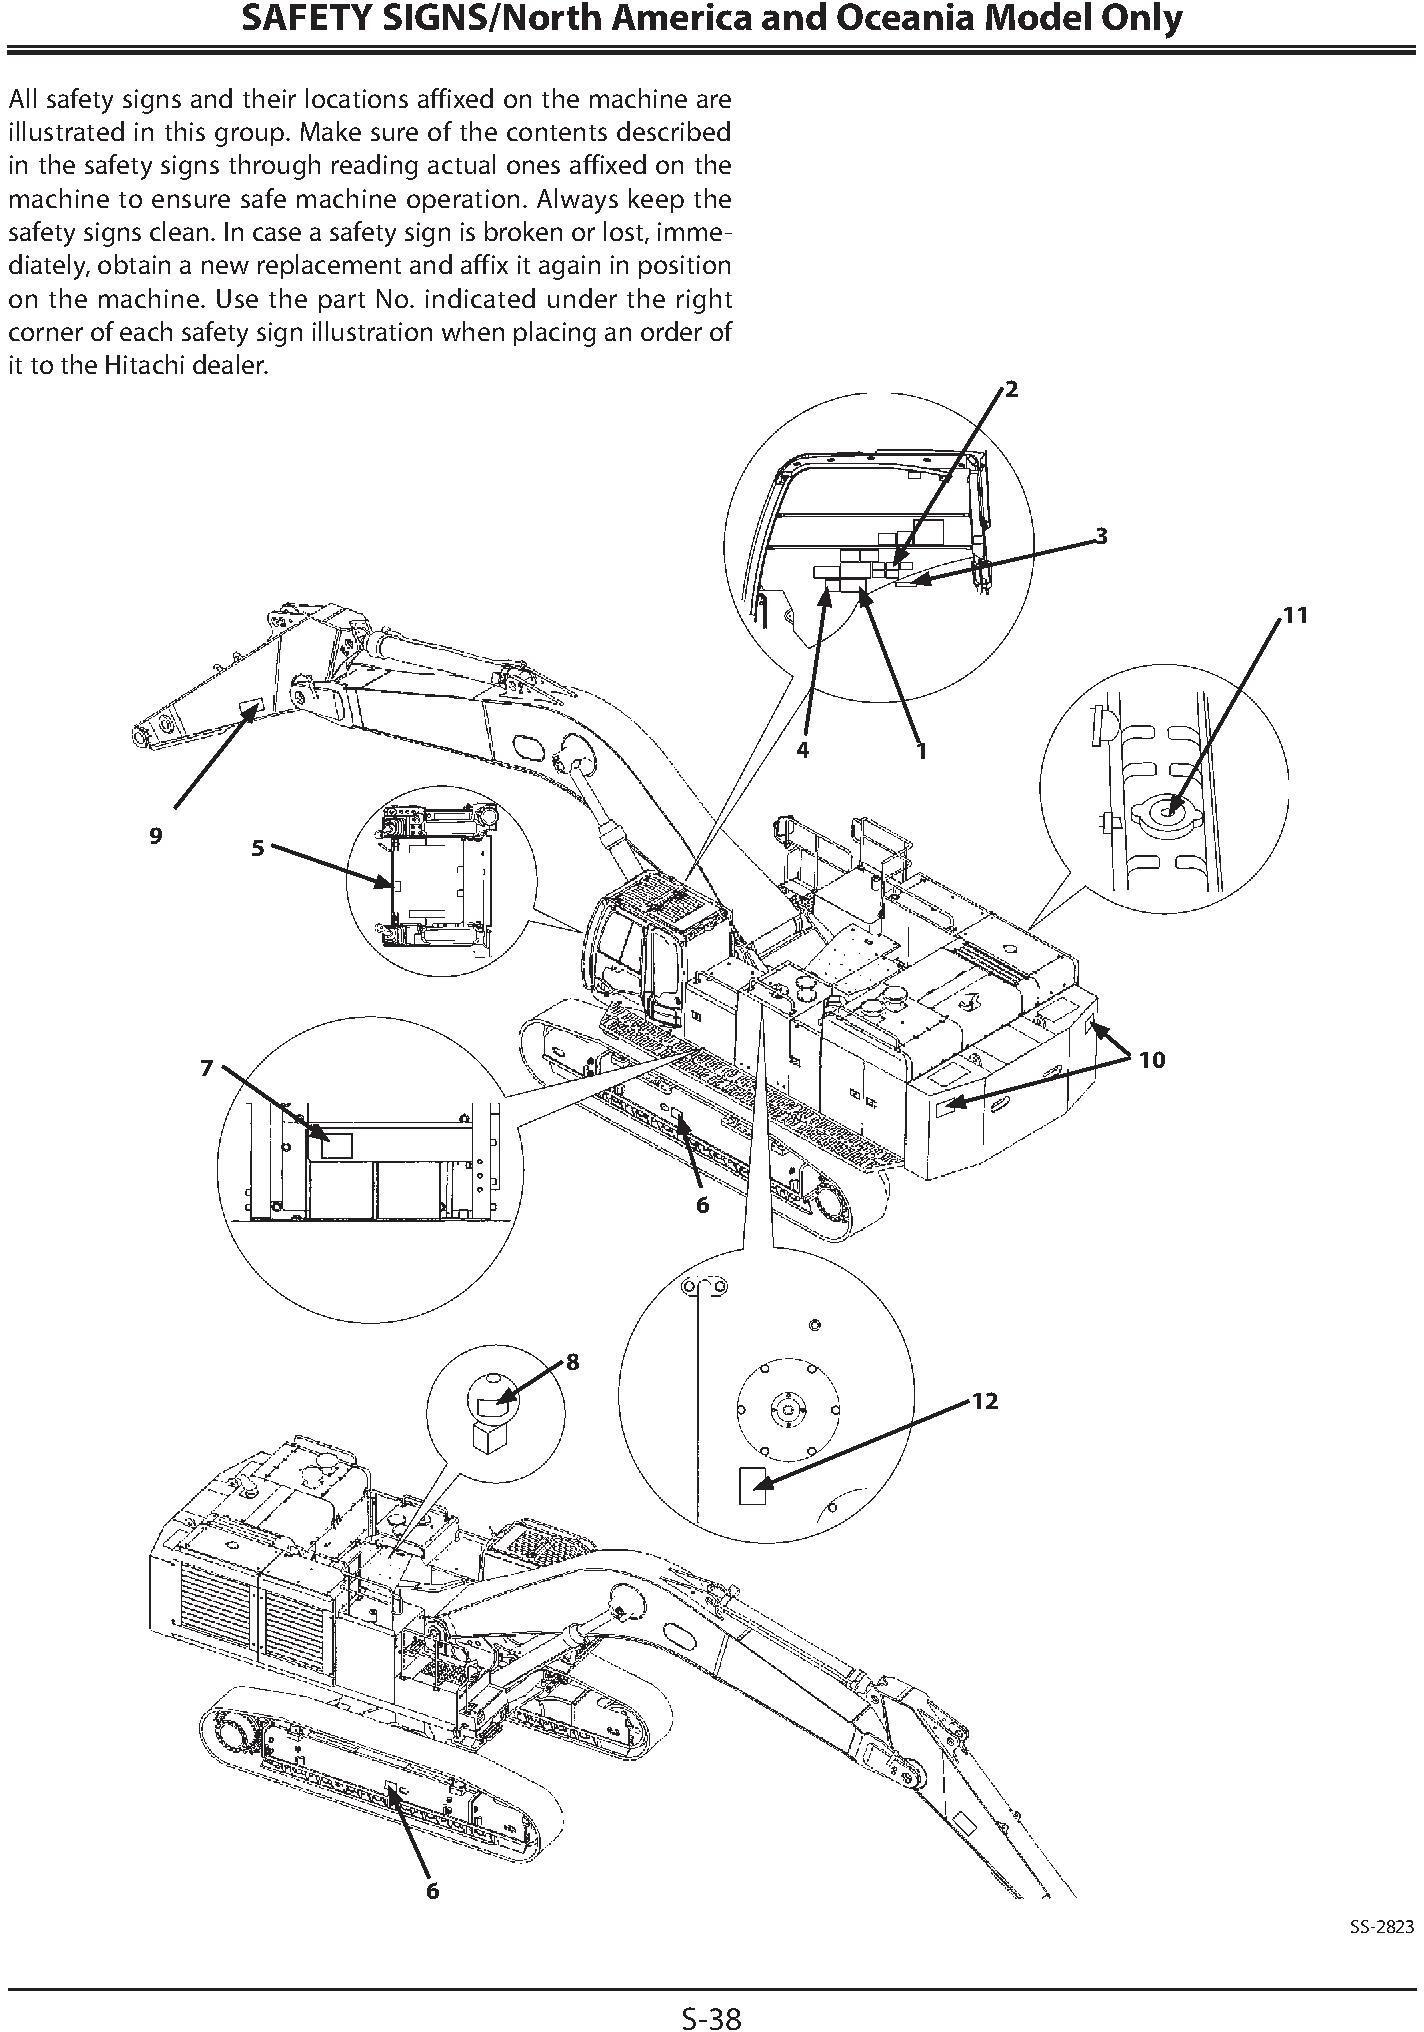 Hitachi Zaxis 850-3, 850LC-3, 870H-3, 870LCH-3 Excavator